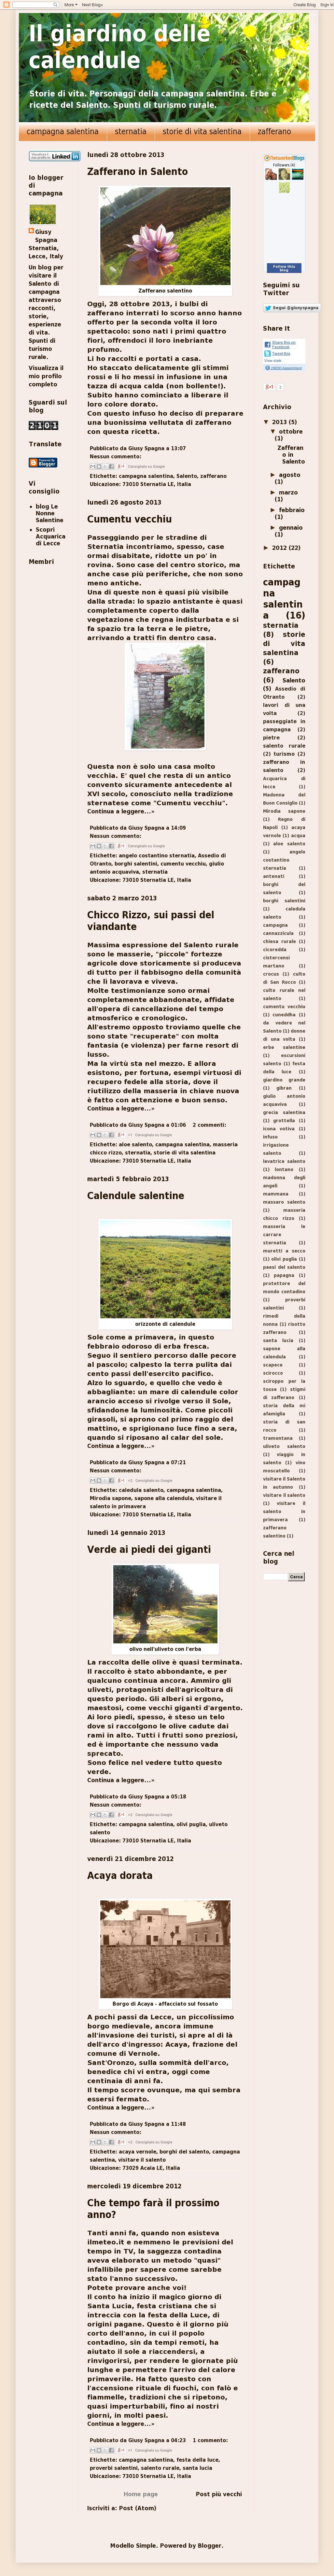 The website 'ilgiardinodellecalendule.blogspot.it' courtesy of @Pinstamatic (http://pinstamatic.com)